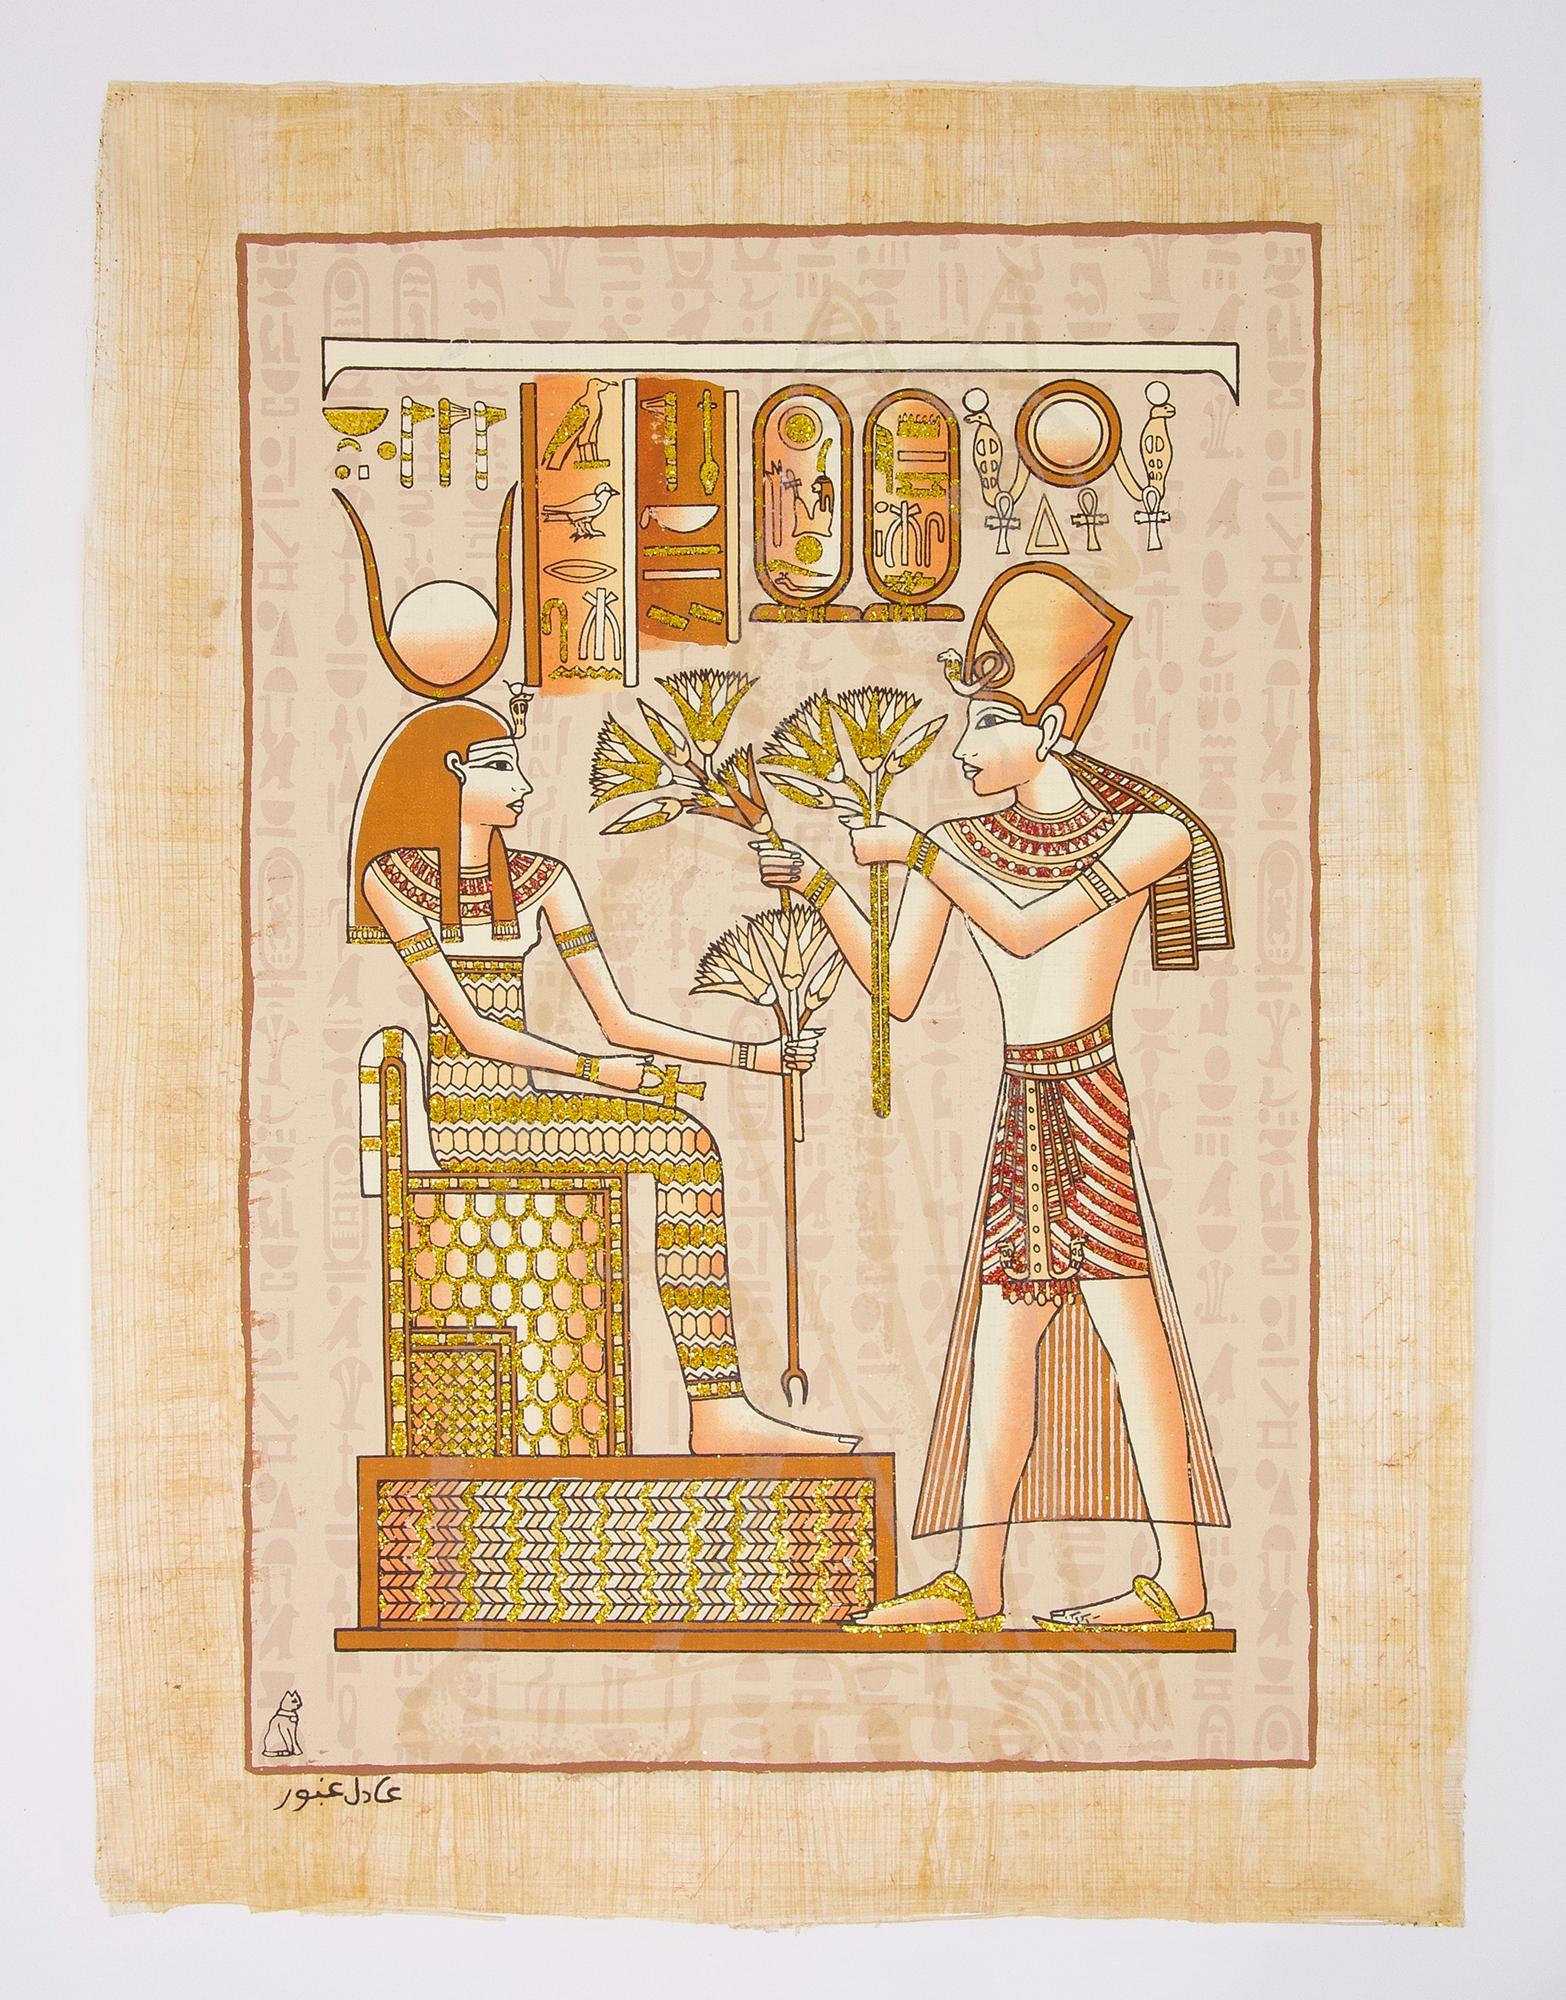 Rameses the great offering lotus flowers to isis www rameses the great offering lotus flowers to isis ancientegyptshop izmirmasajfo